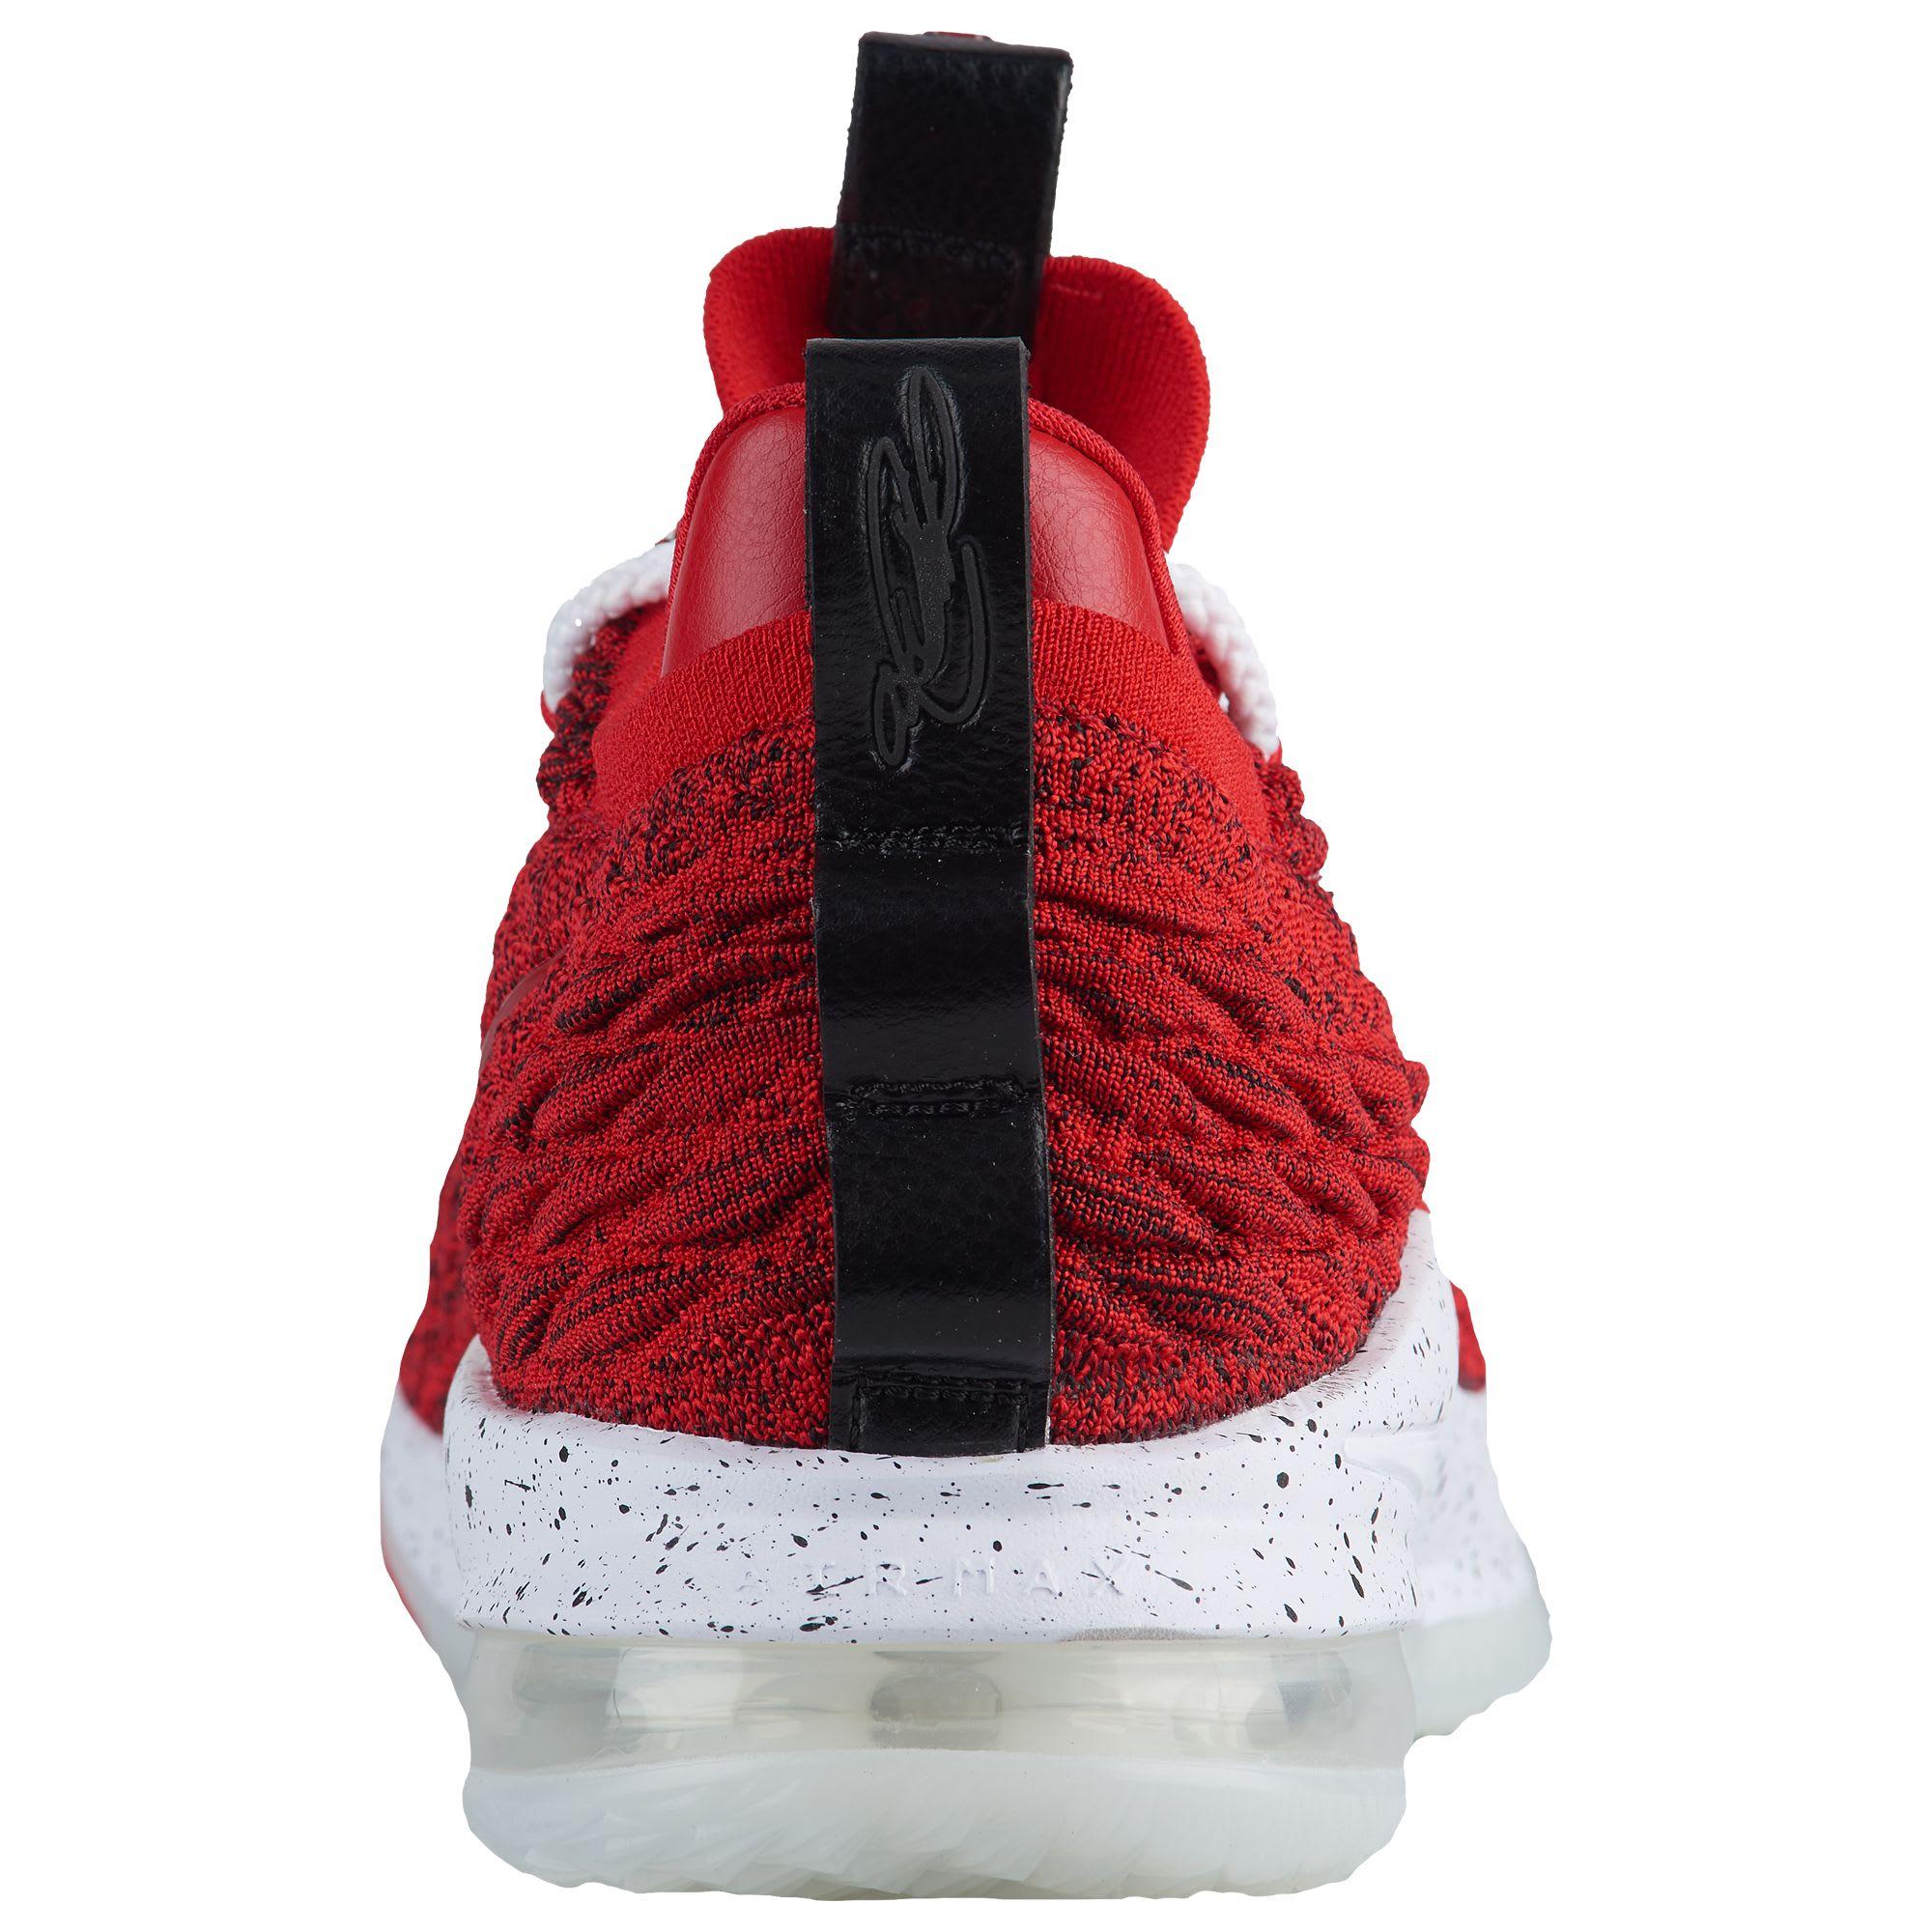 new style 68997 5d32f ... shopping image via champs sports nike lebron 15 low university red  ao1755 600 8be77 36e6e